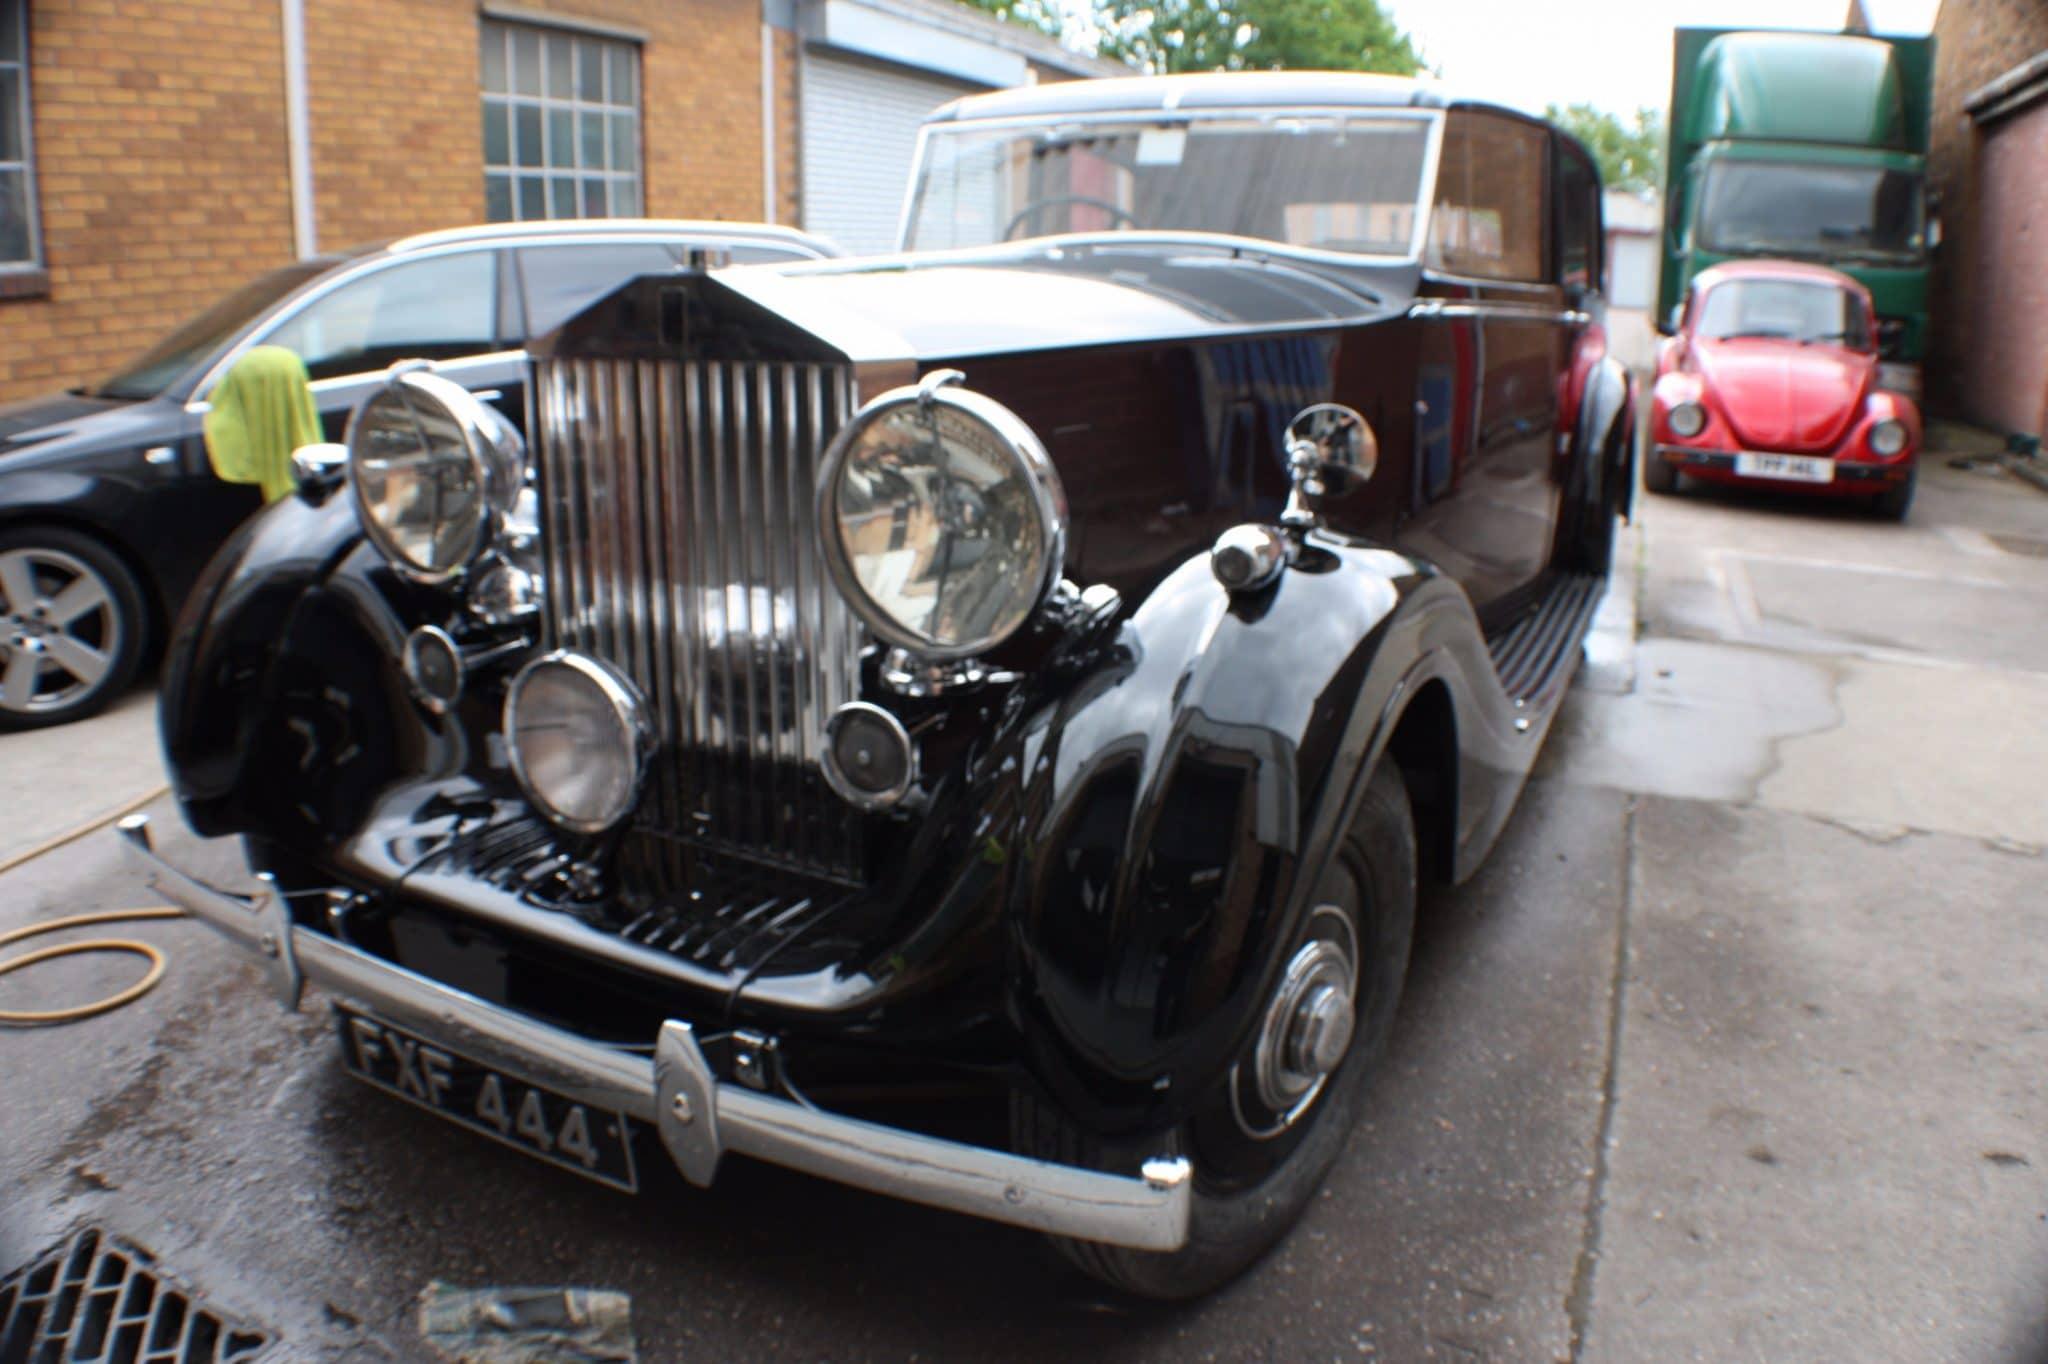 Rolls Royce restoration complete